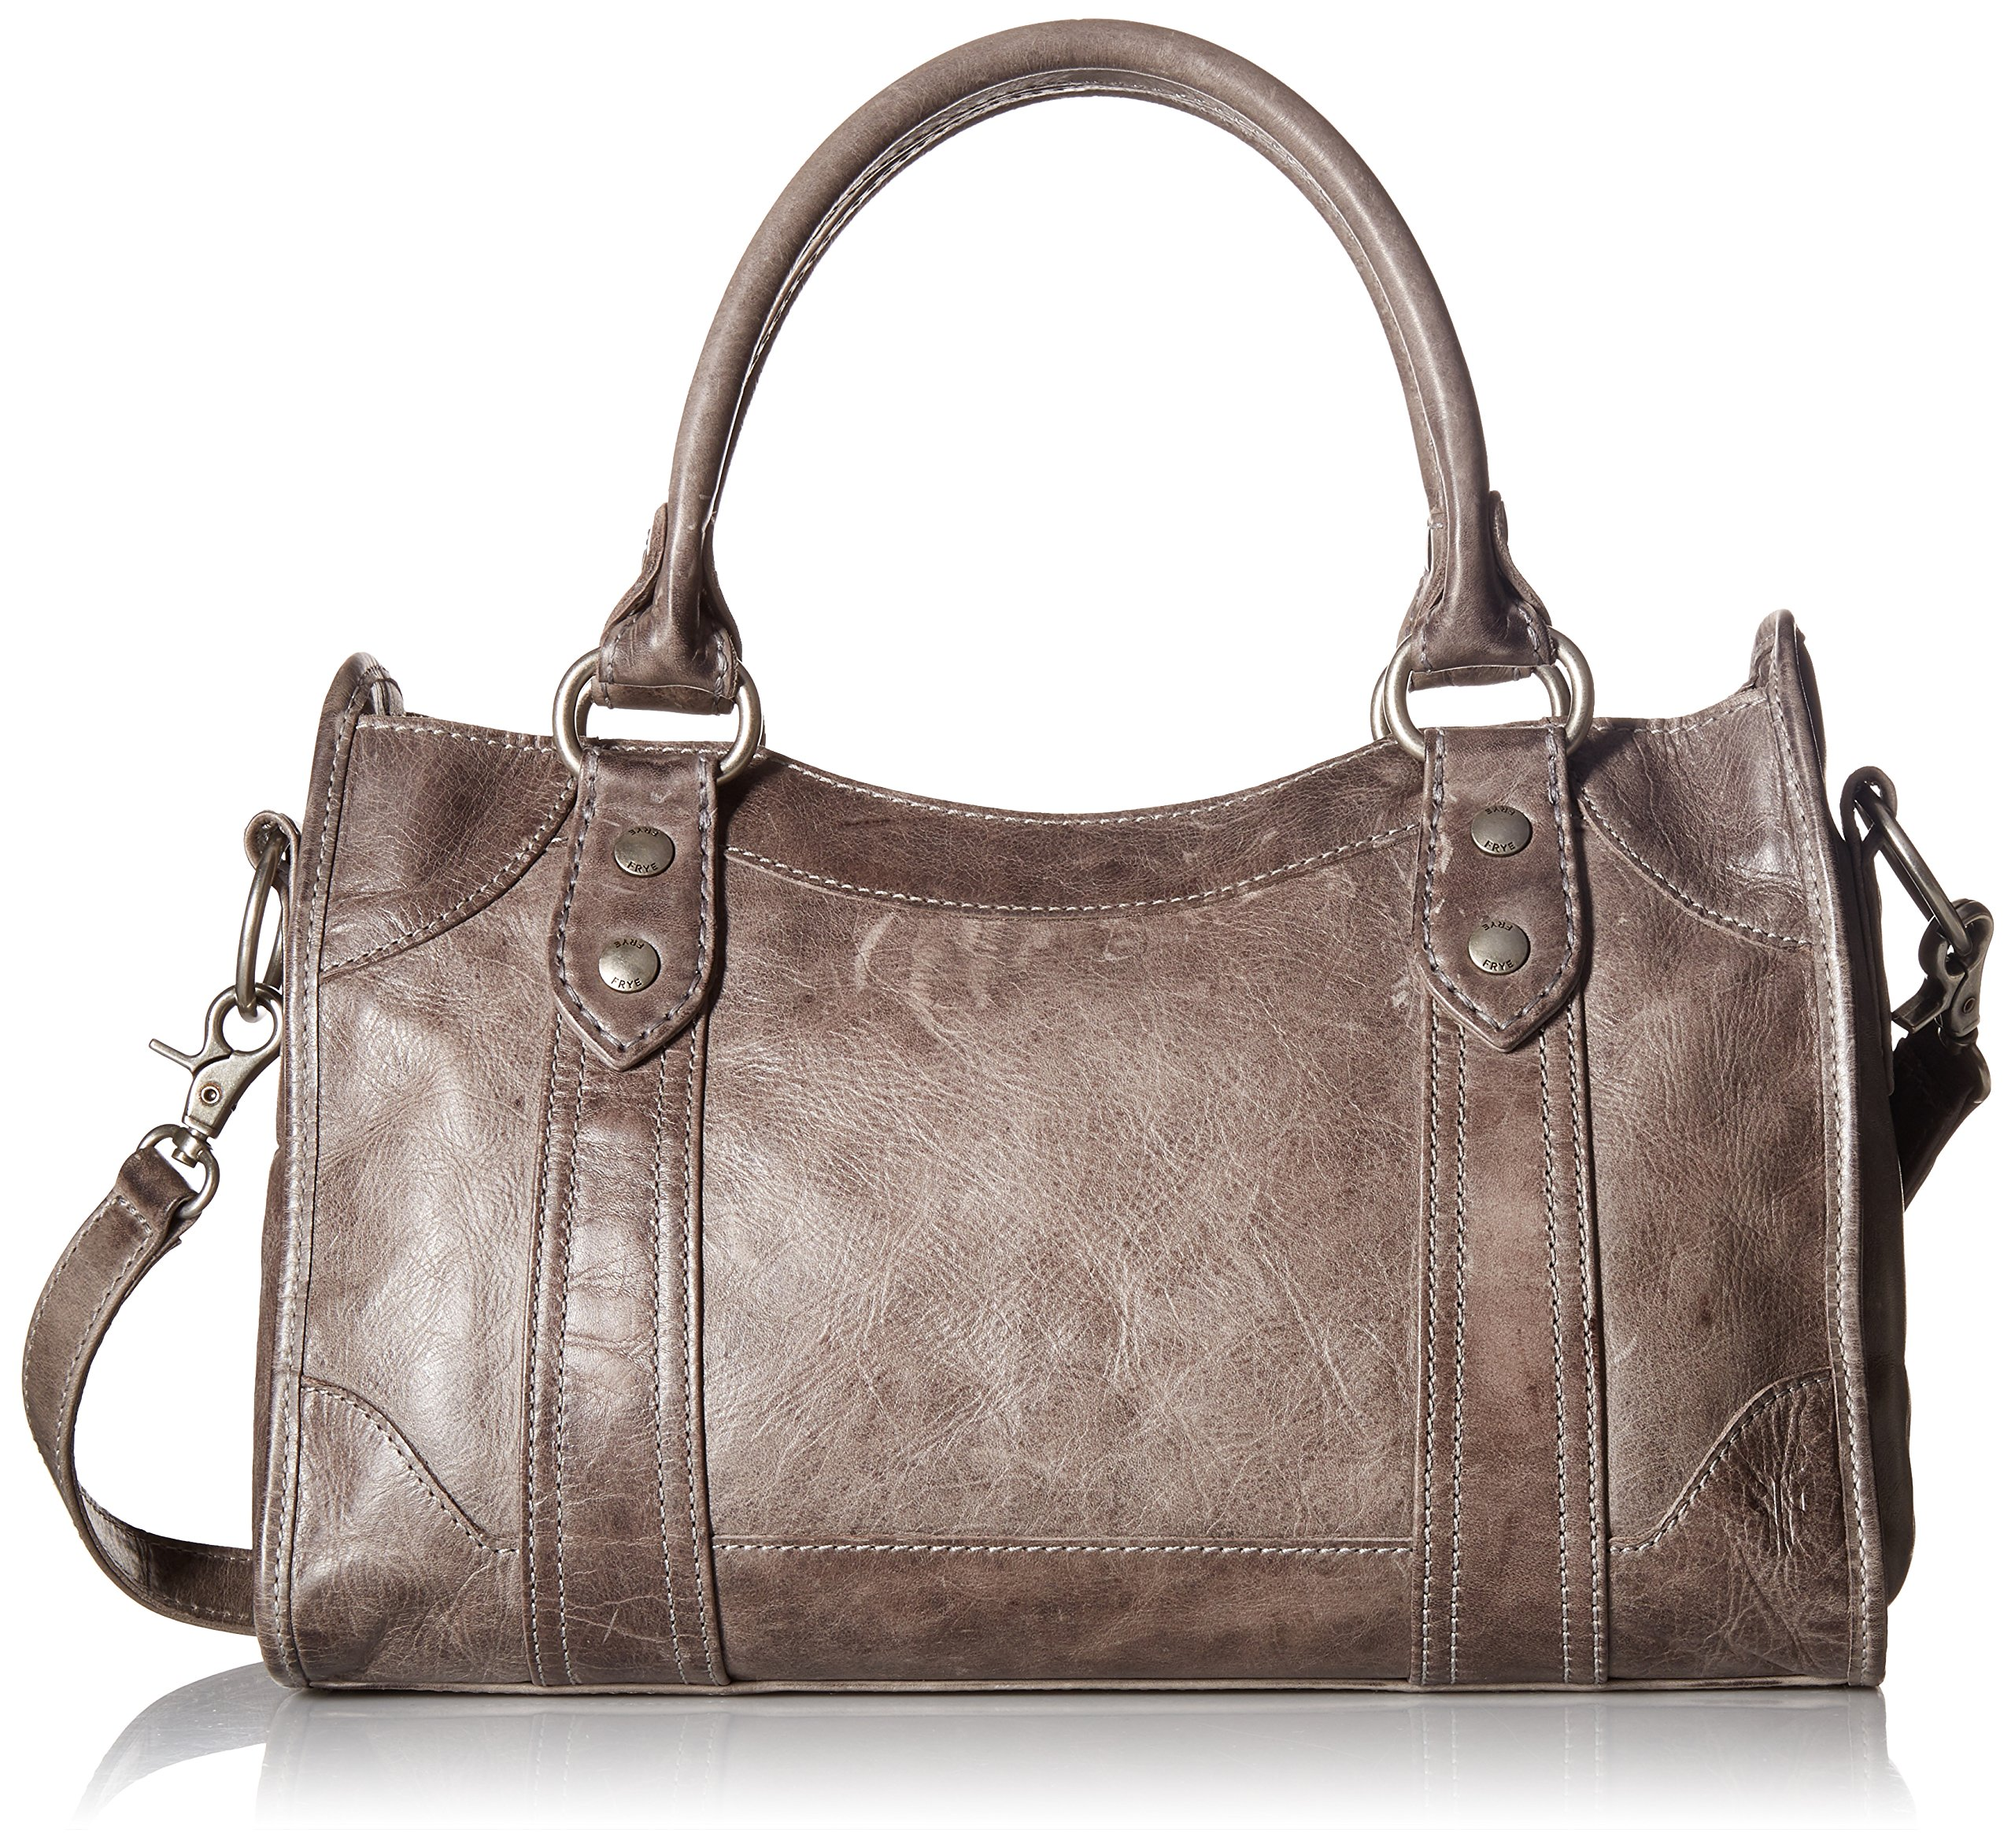 FRYE Melissa Satchel Bag, Ice, One Size